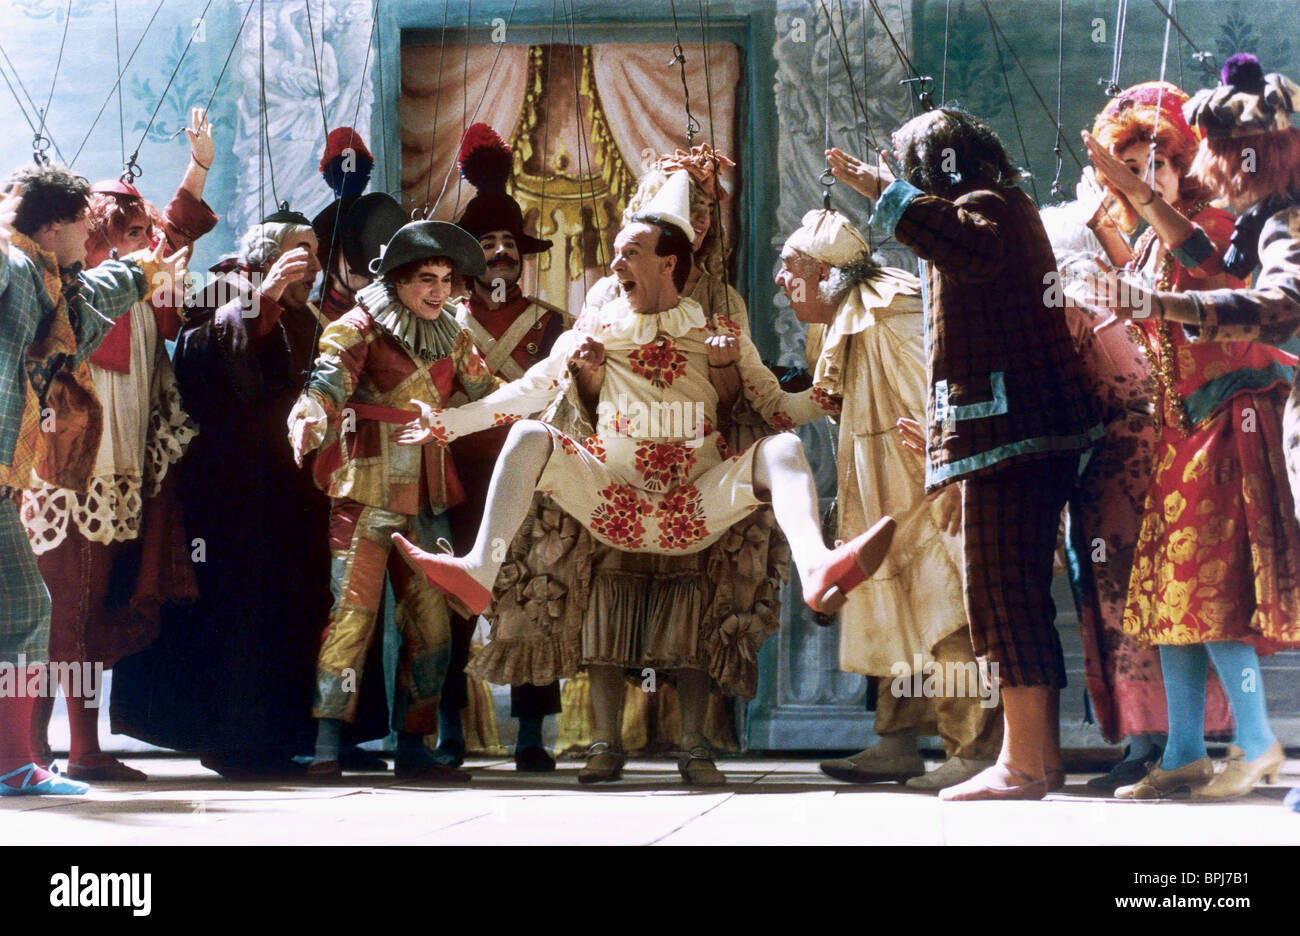 pinocchio 2002 full movie download